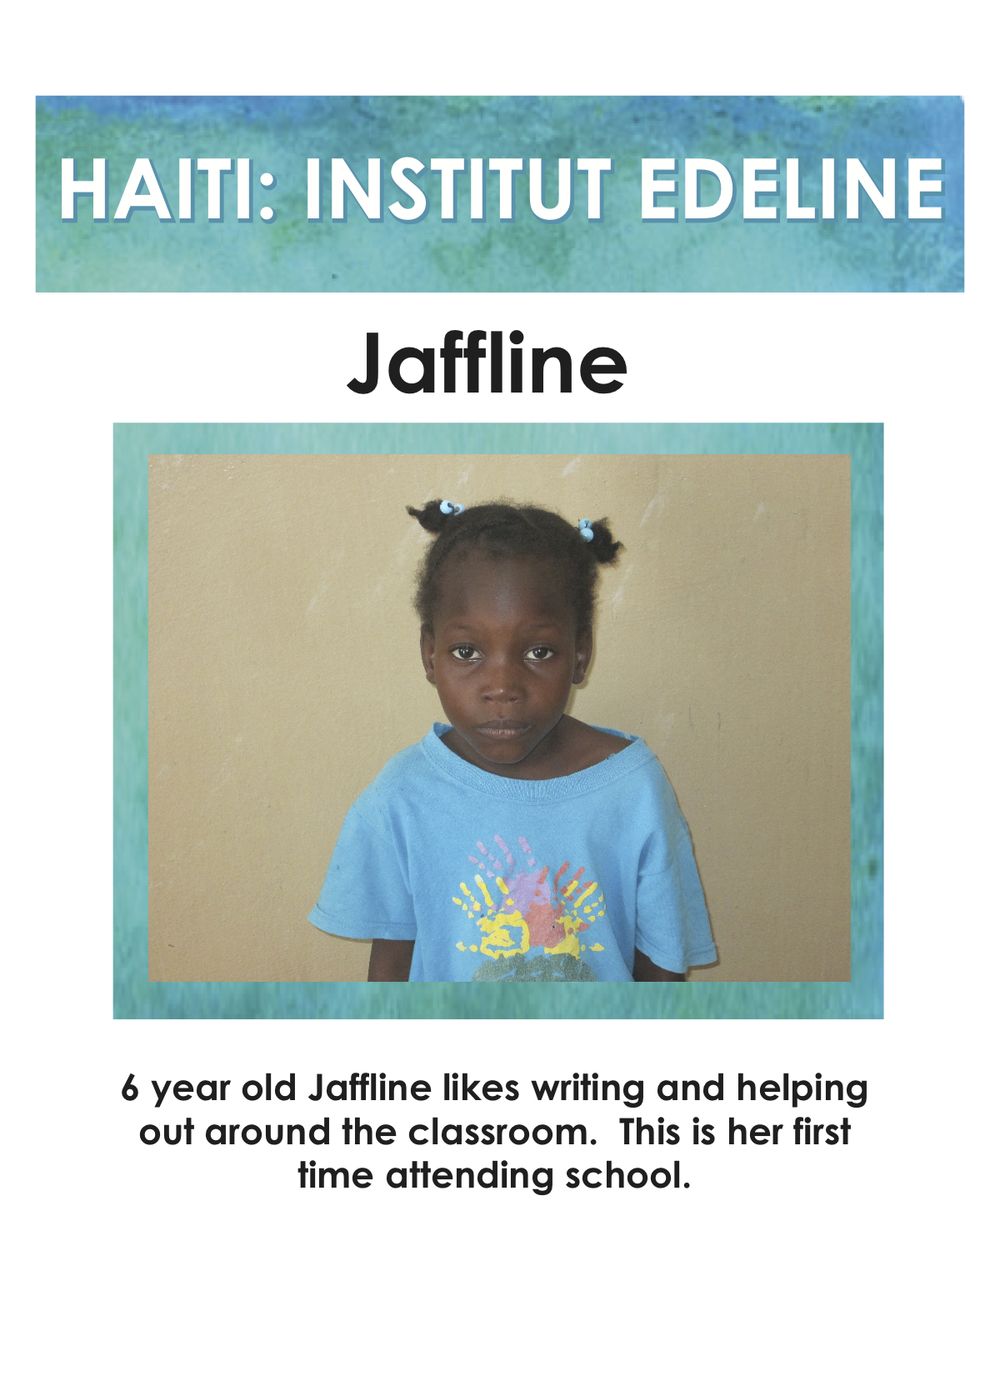 Jaffline.jpg